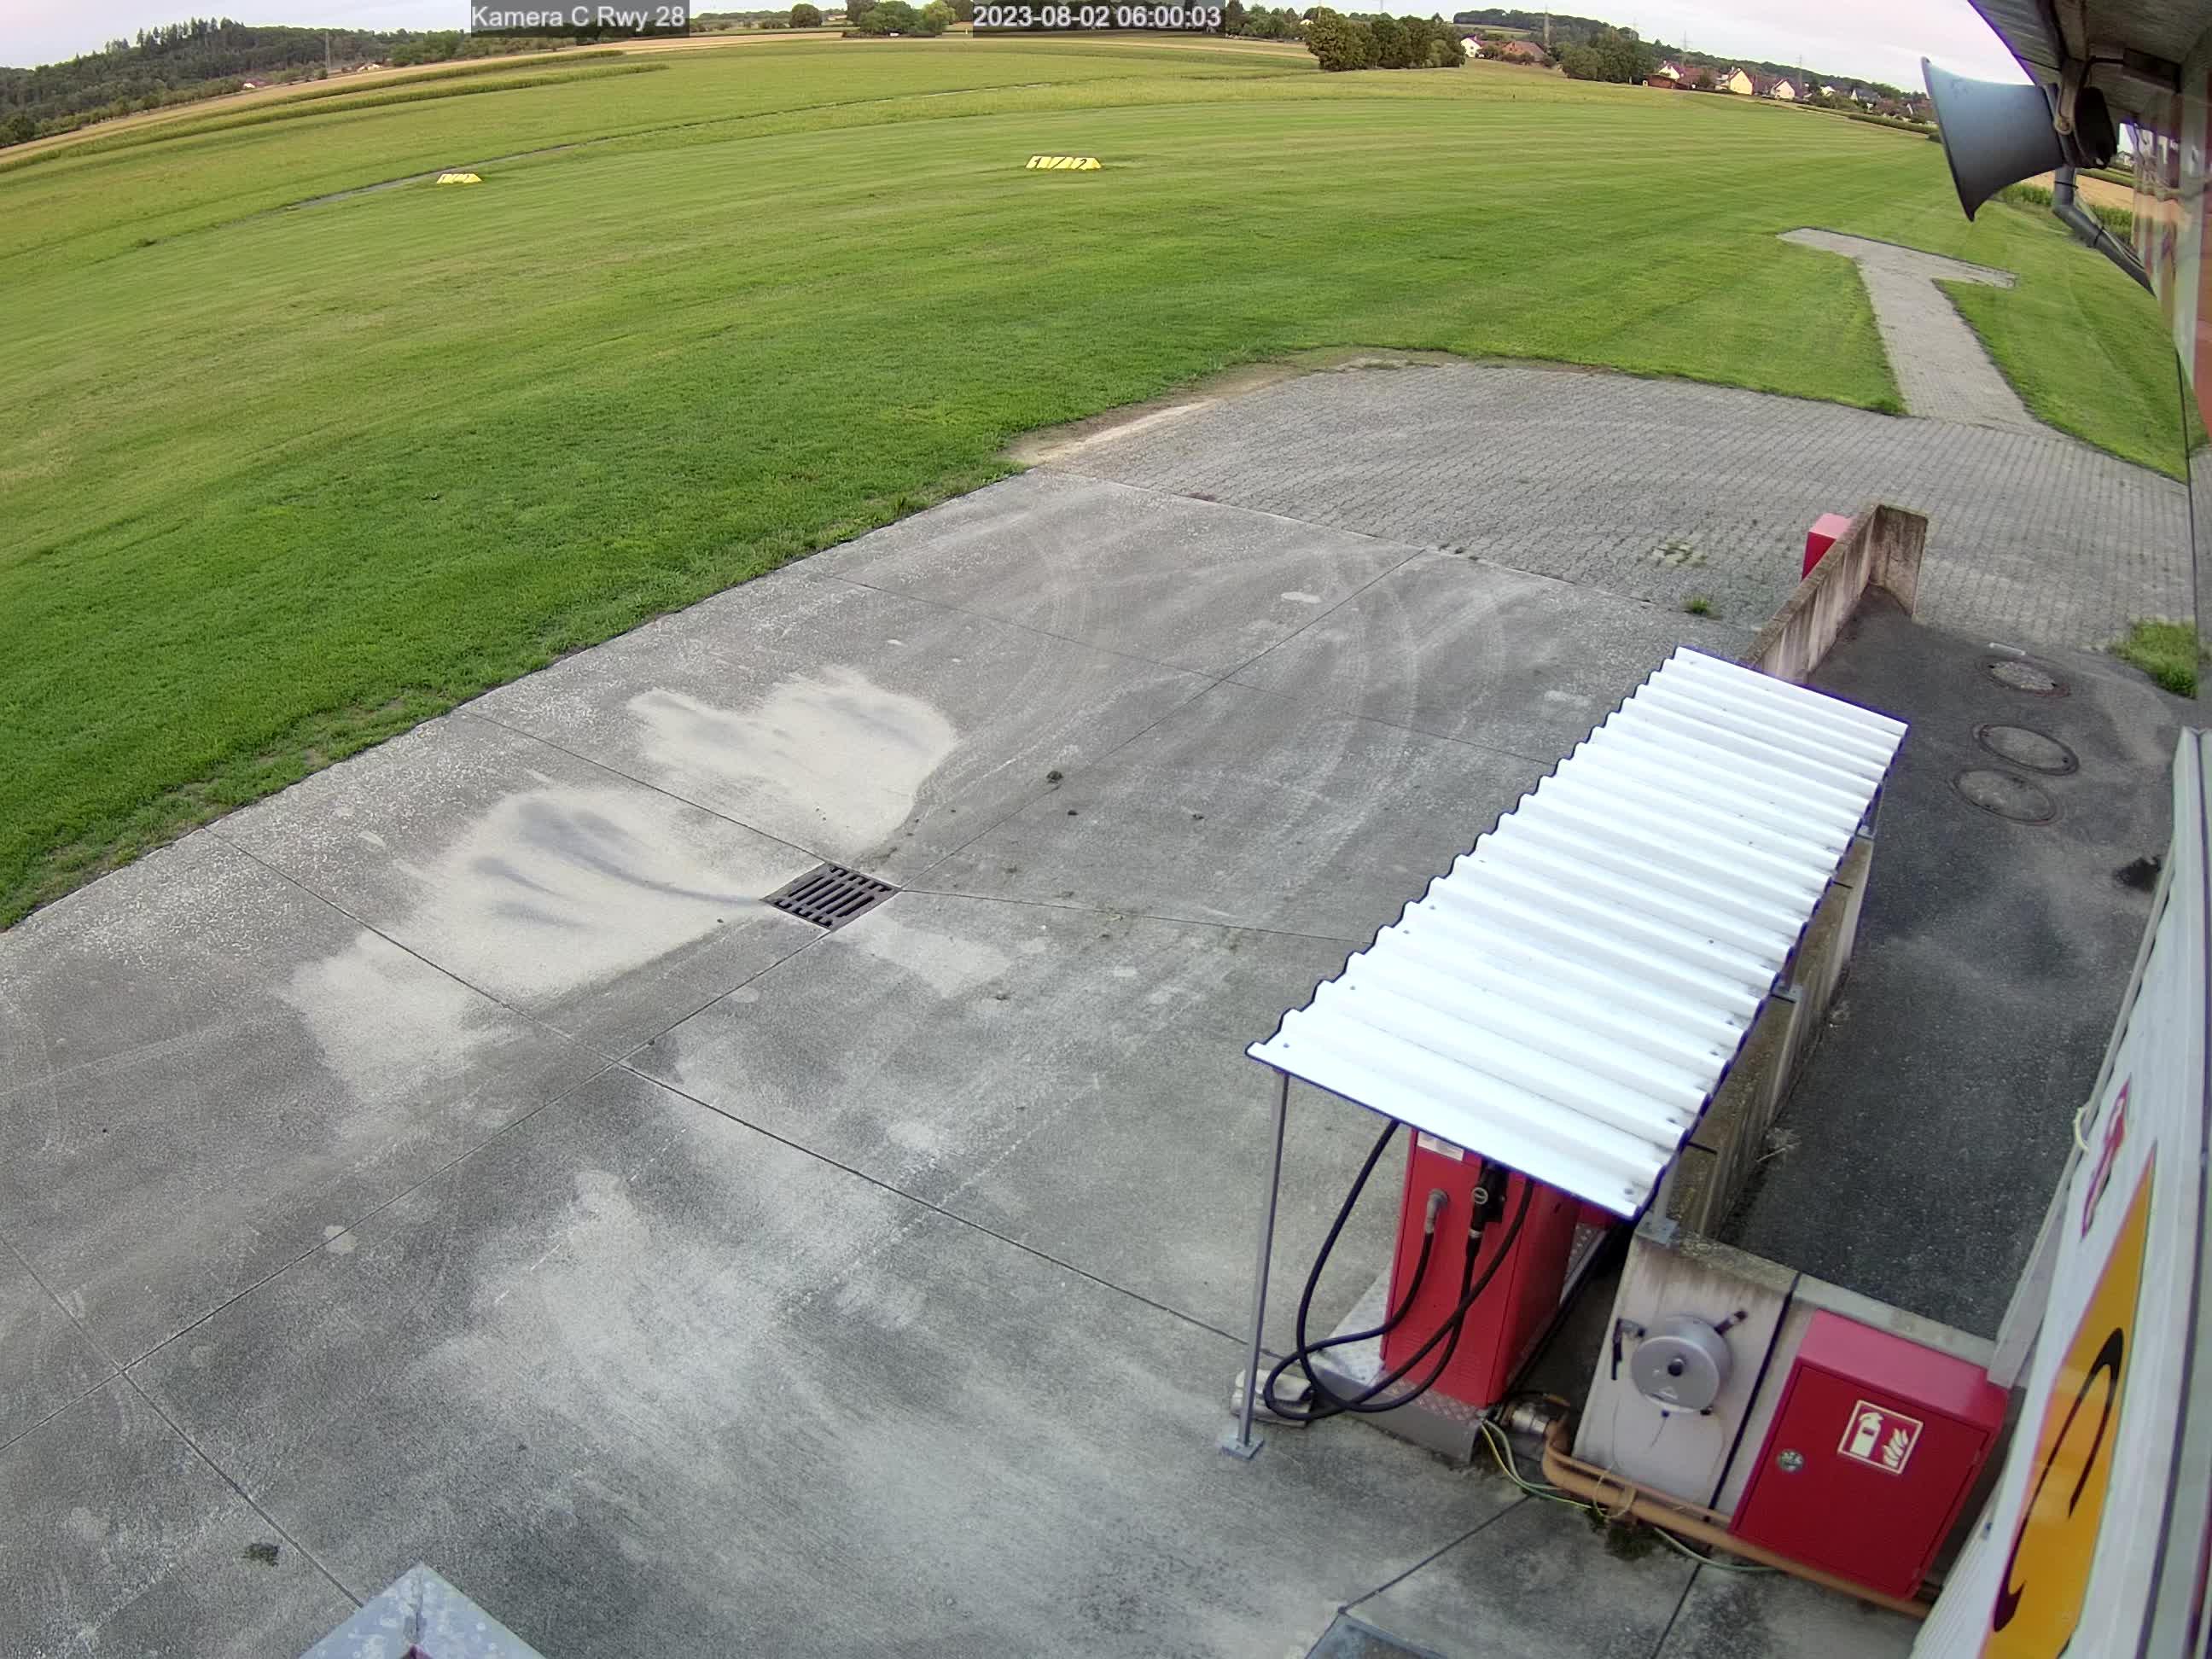 Webcam-Bild in Richtung Westen, Piste 28